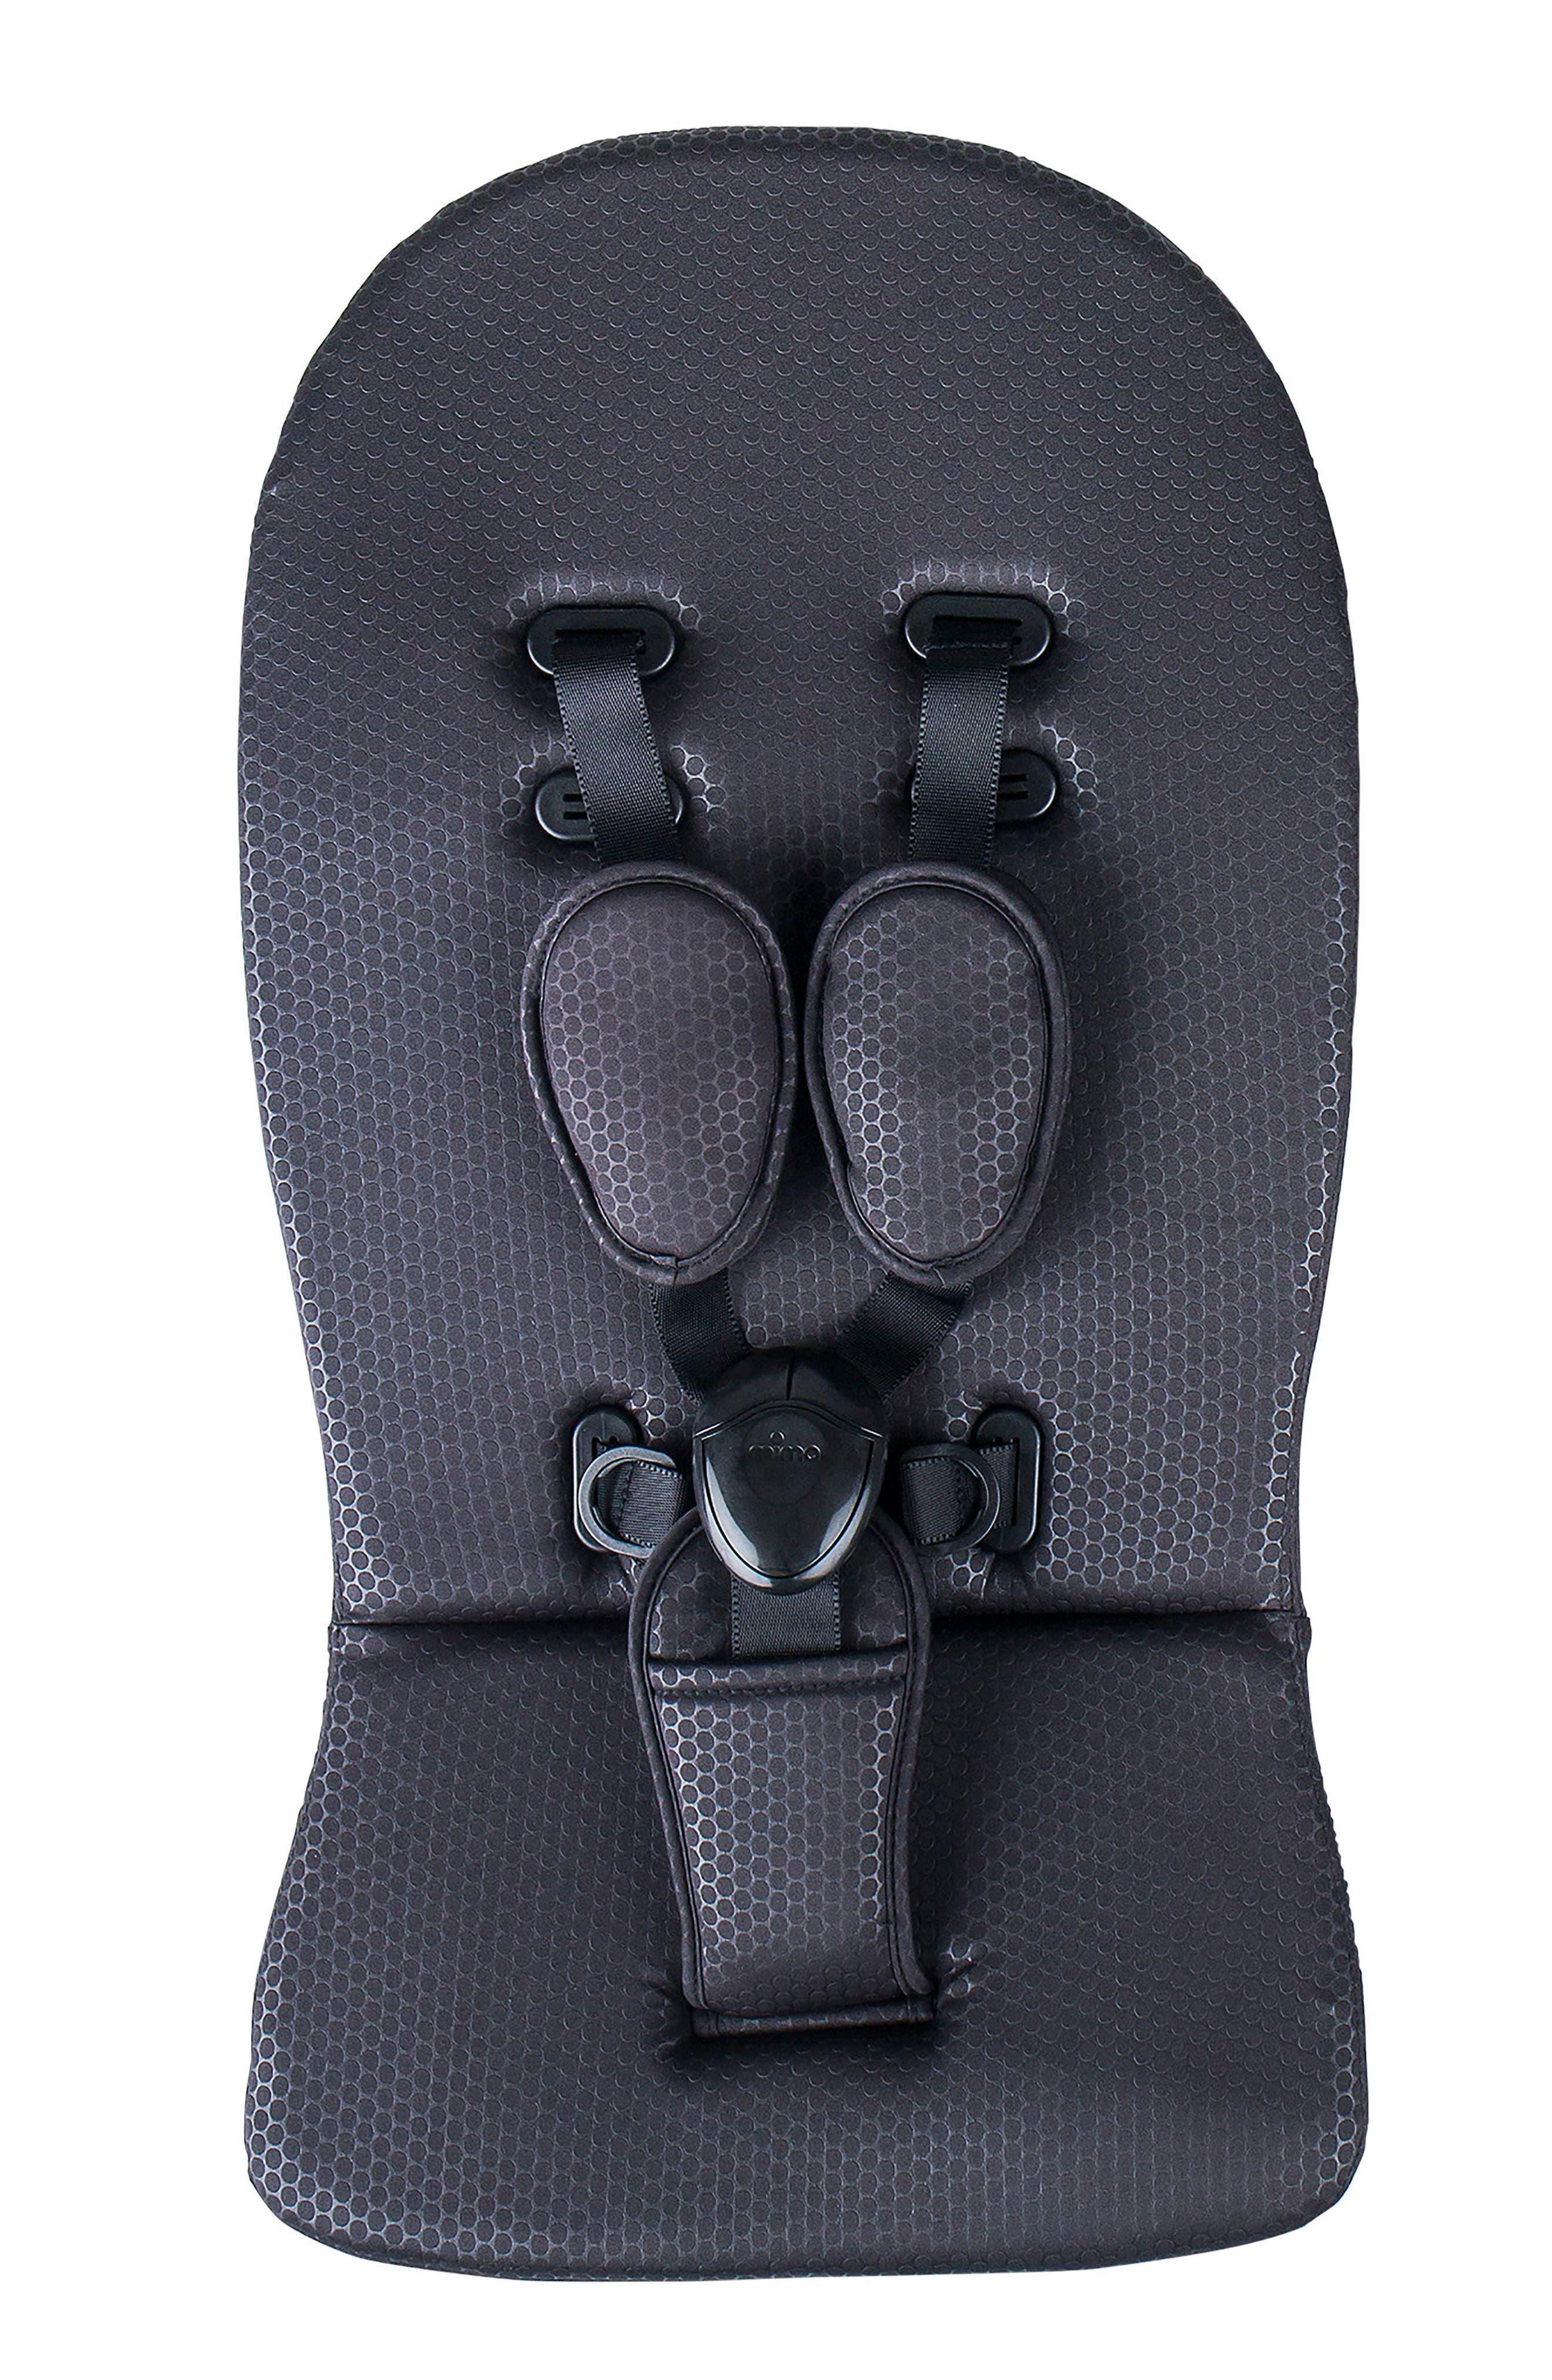 Comfort Padding Kit for Mima Xari or Kobi Strollers,                             Main thumbnail 1, color,                             001